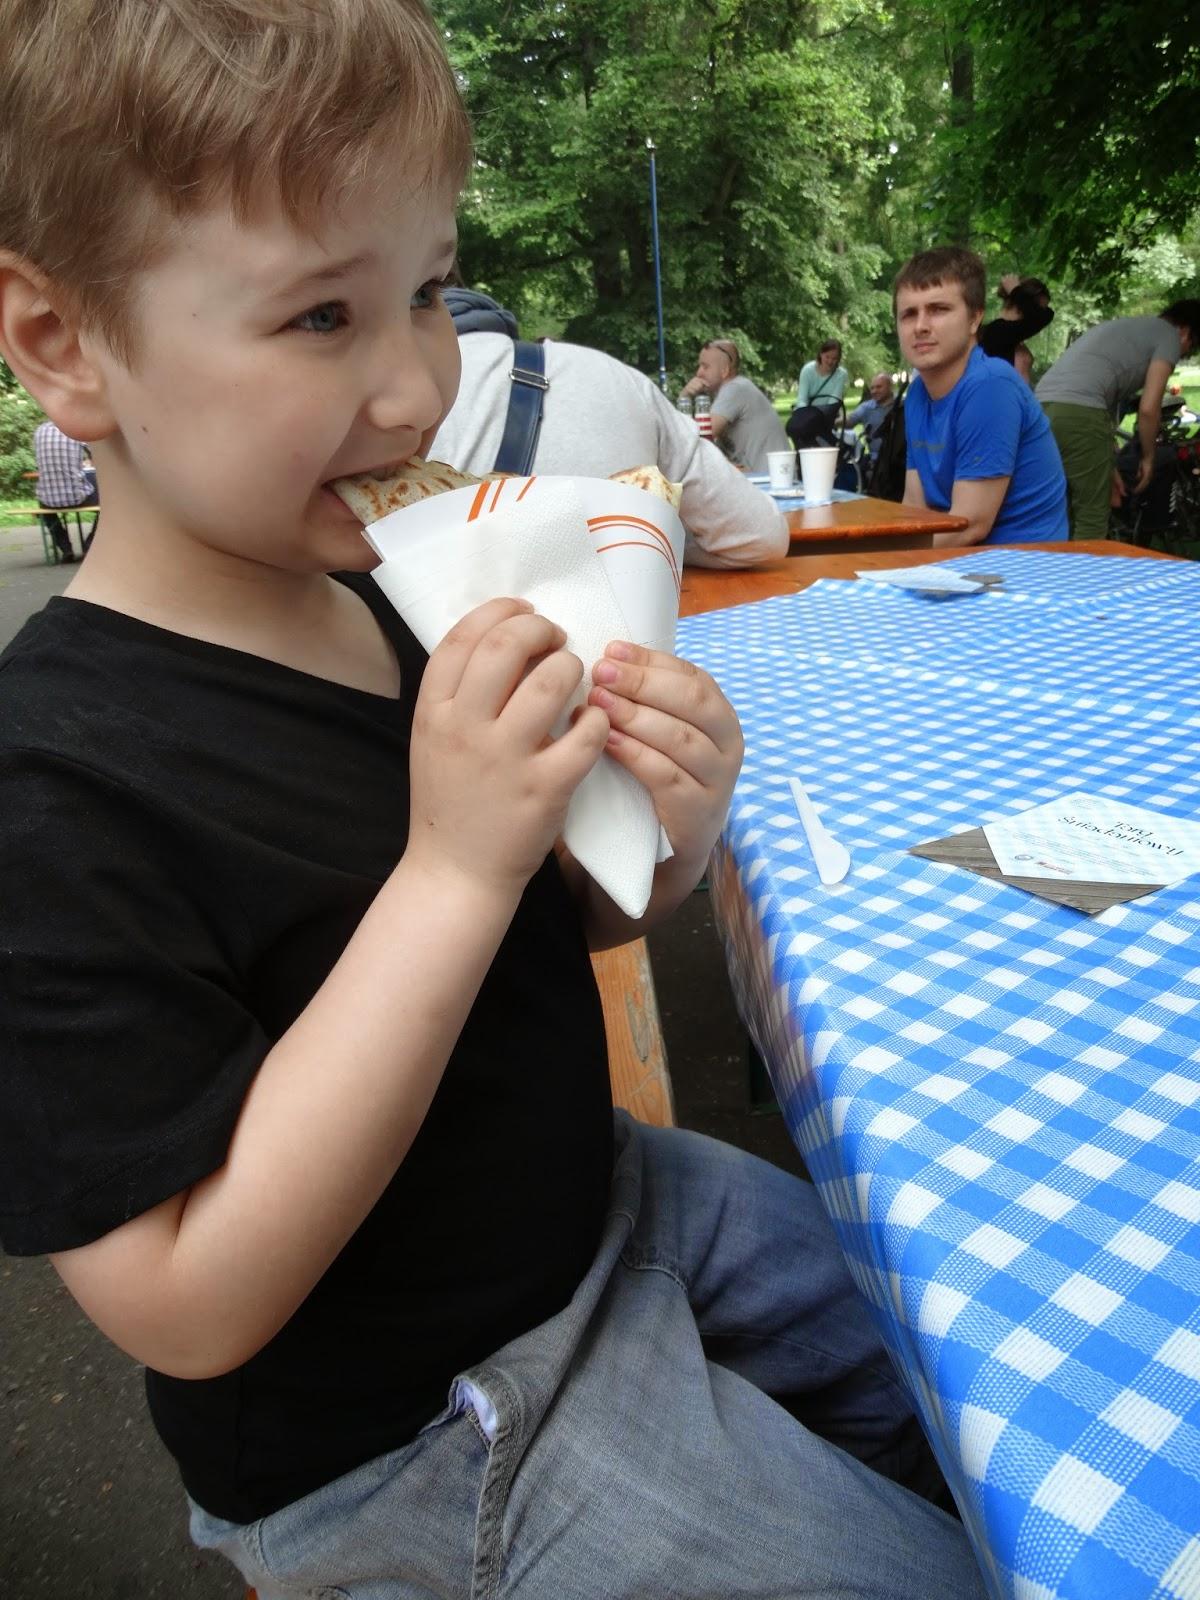 Targ Śniadaniowy, Park Krakowski, naeśniki, posiłek